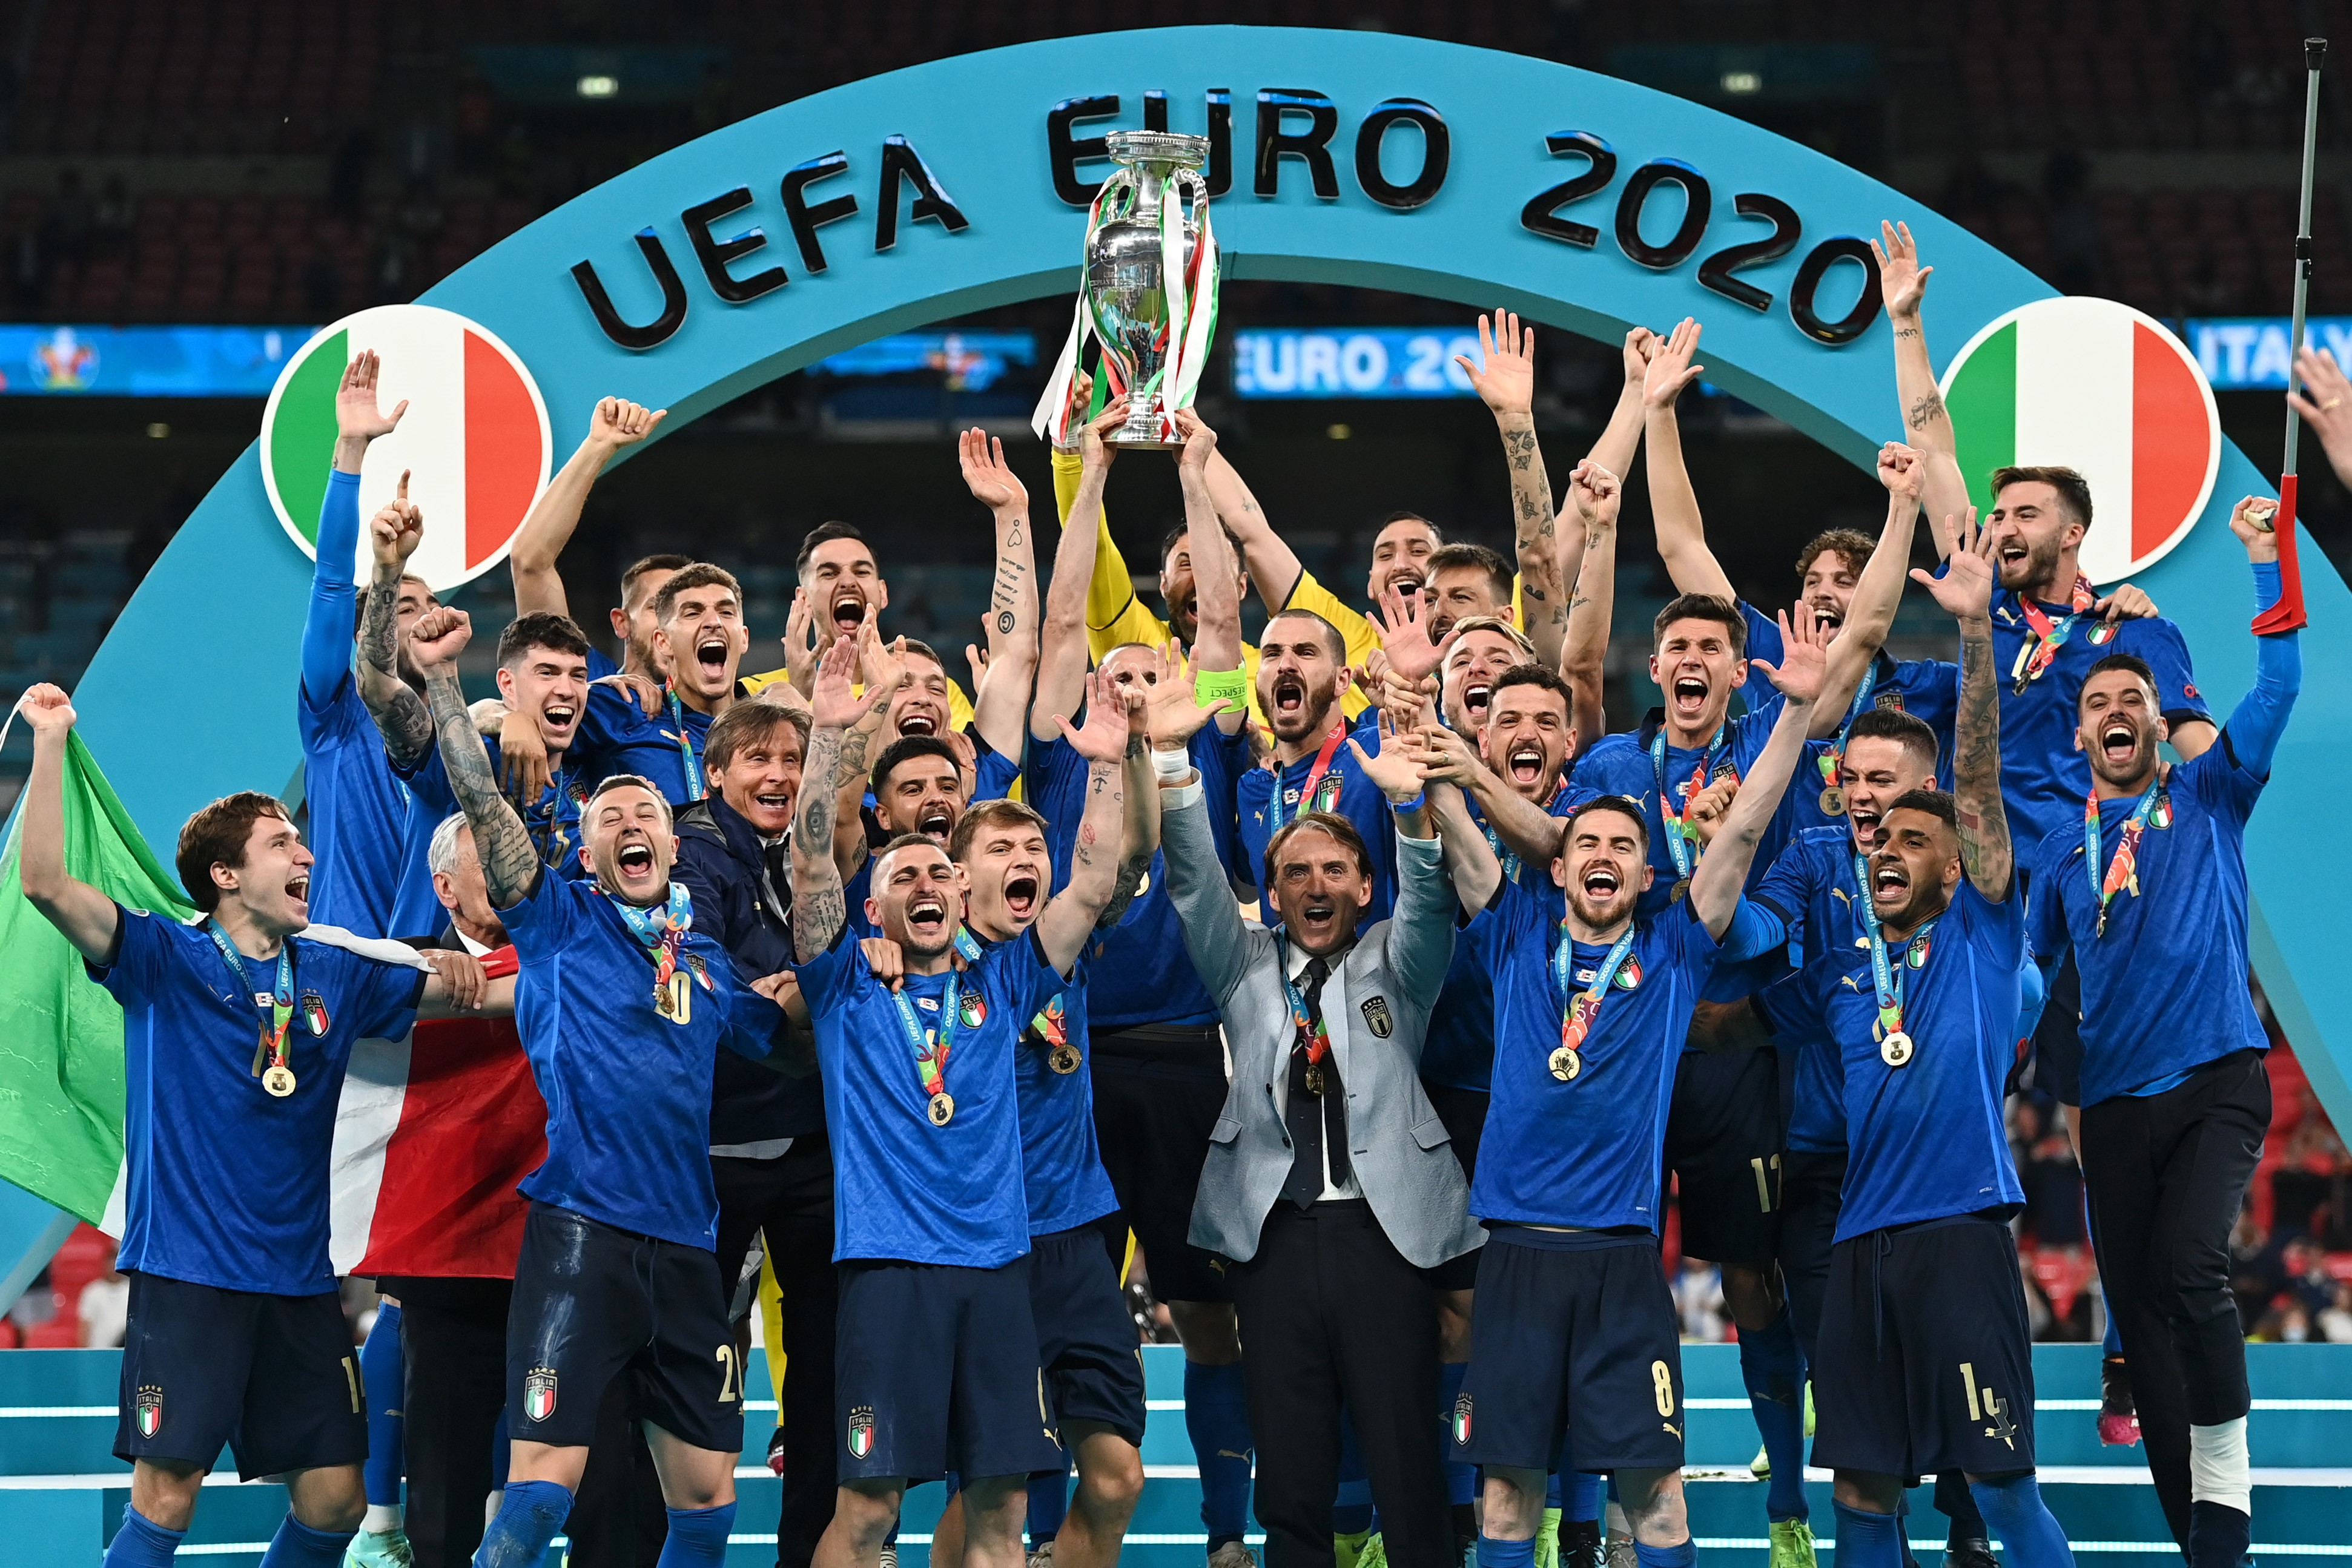 https://i.eurosport.com/2021/07/12/3171821.jpg